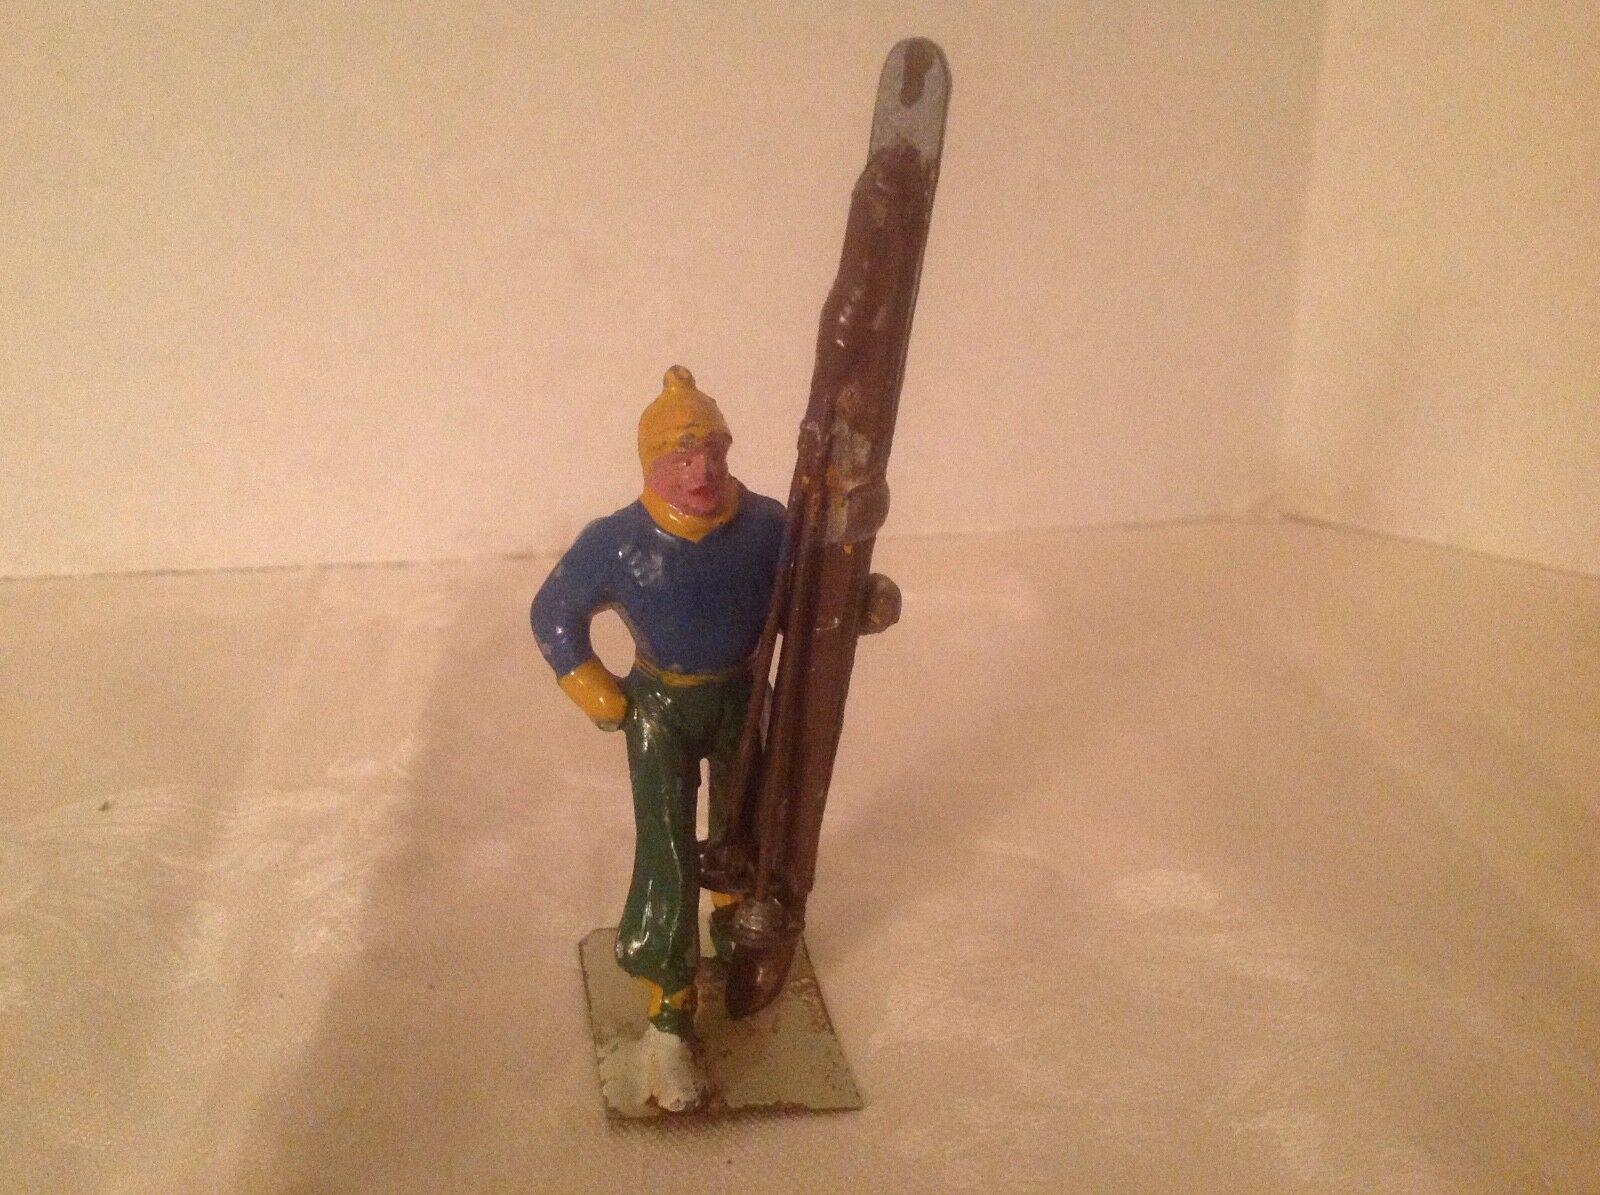 Vintage lead skier carrying skis upright France